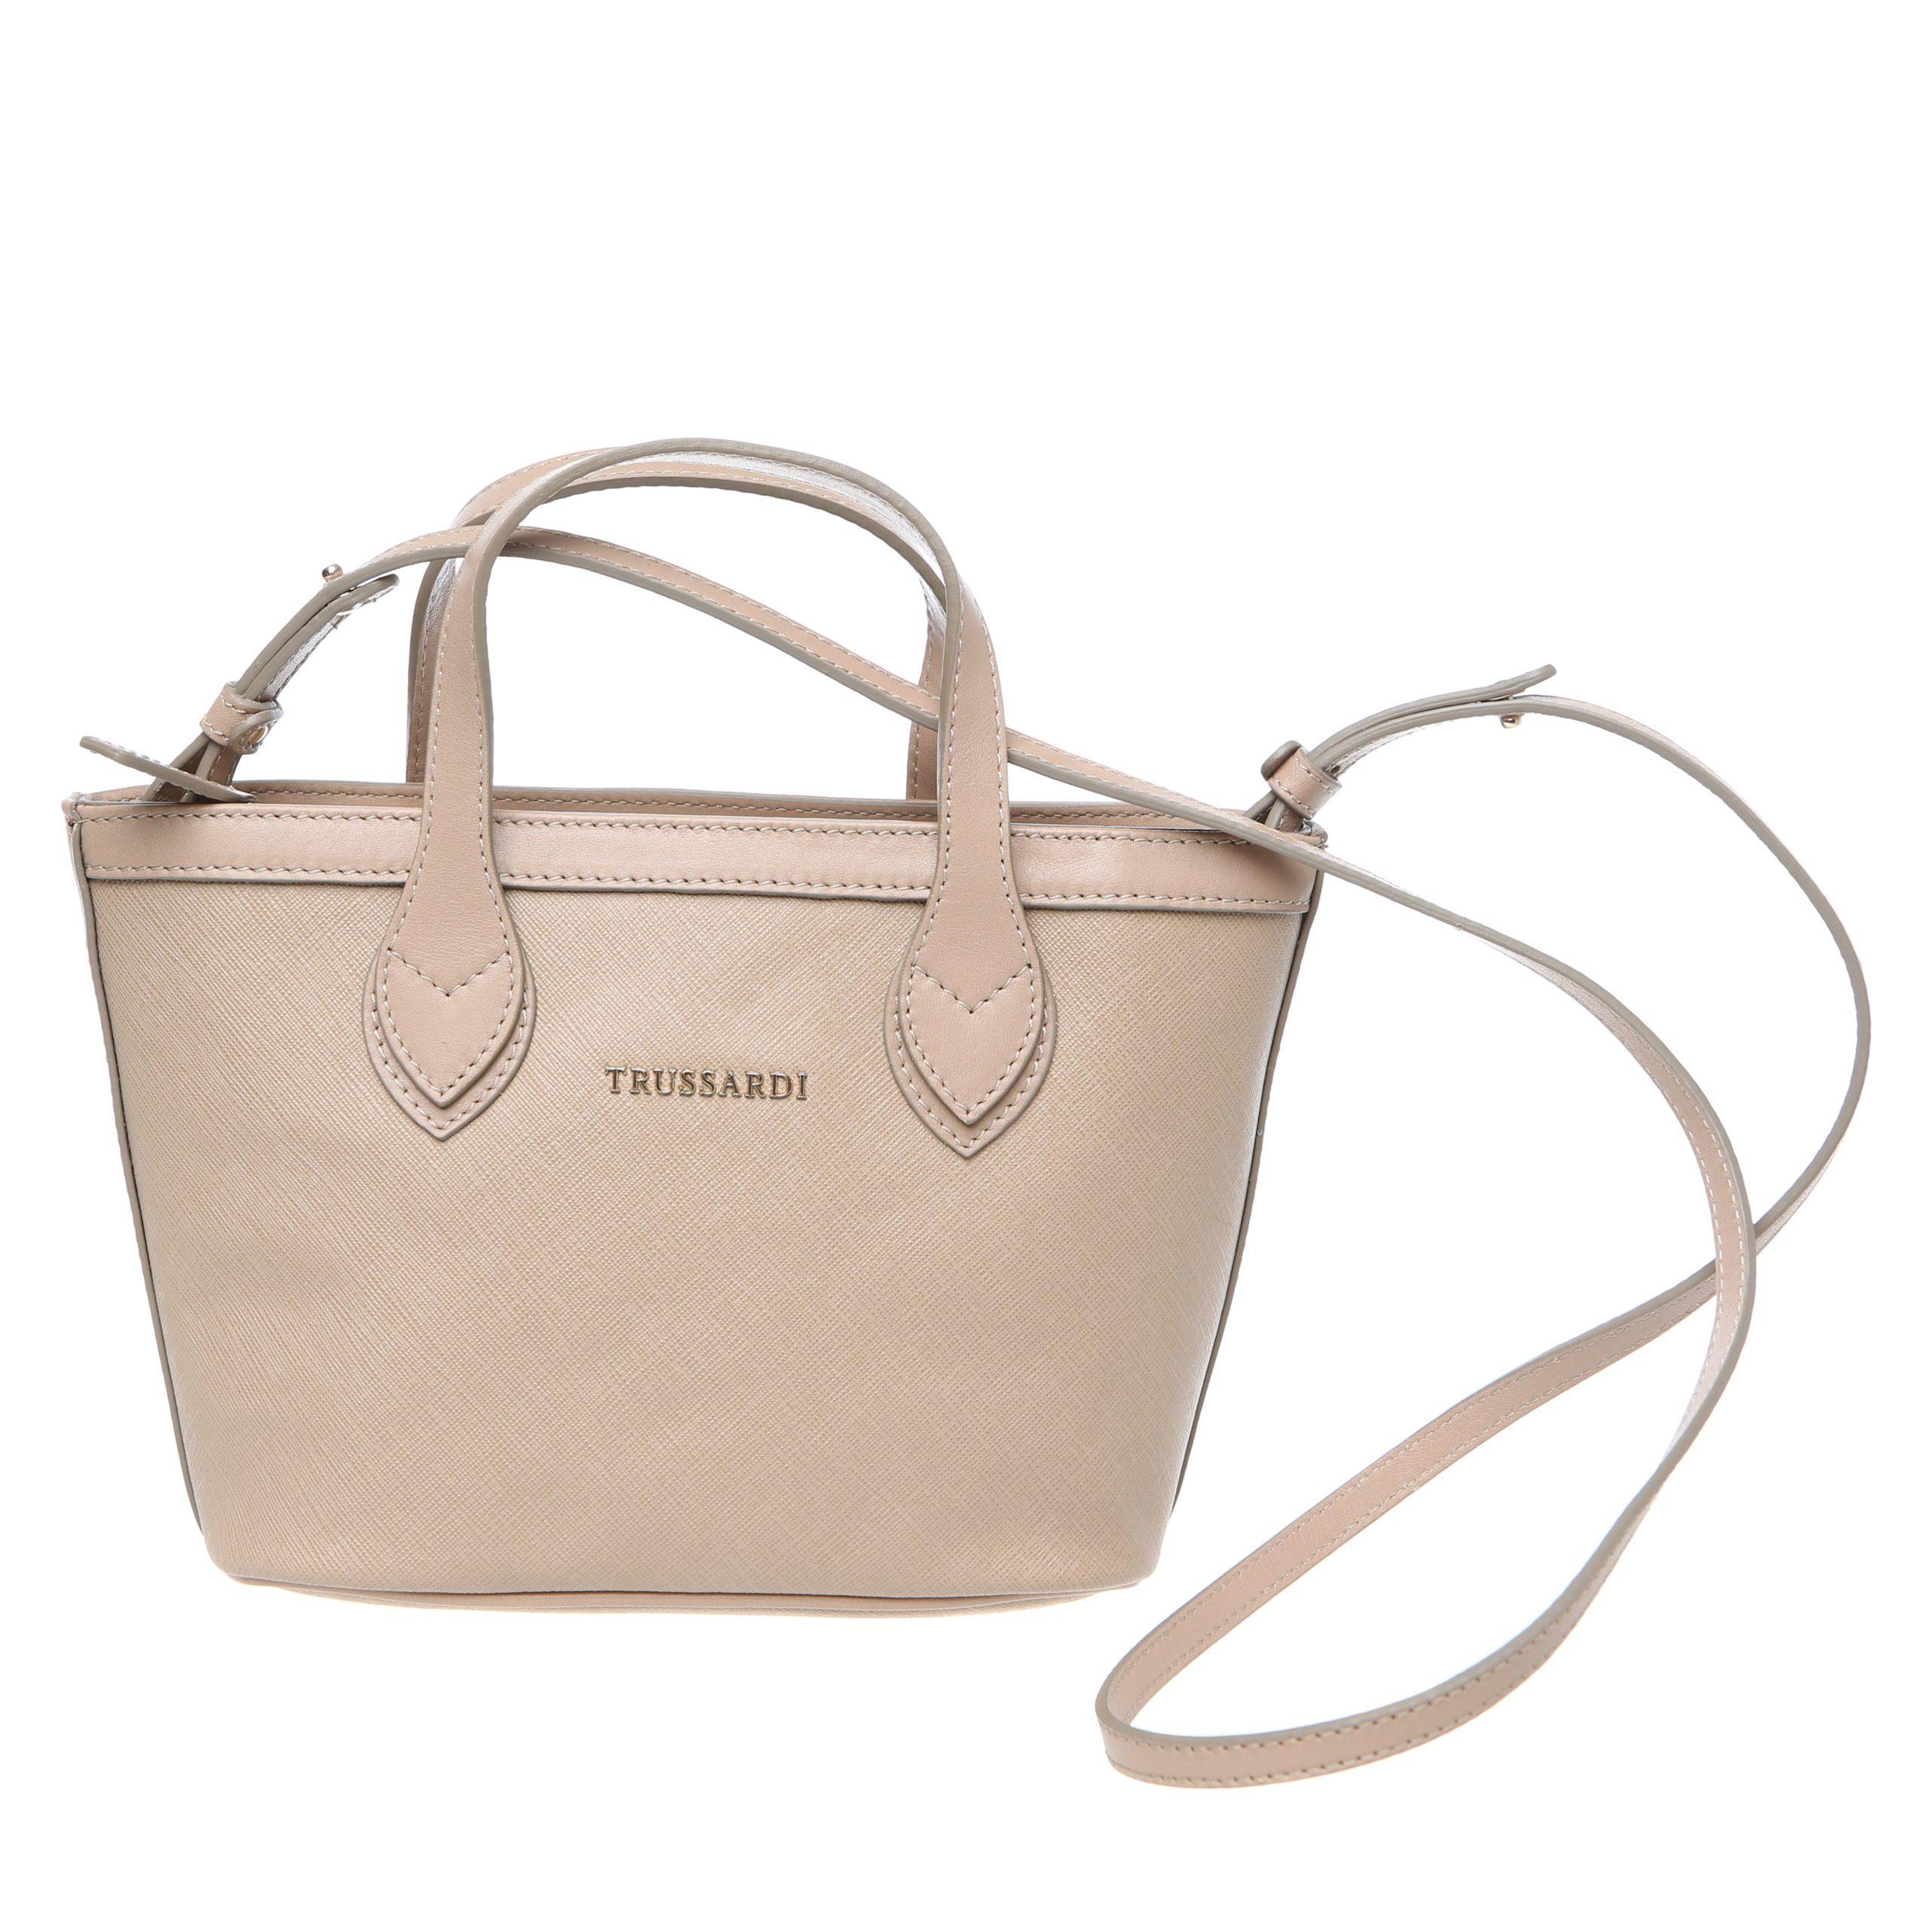 Trussardi Women's Handbag Beige 76B103M_60Taupe